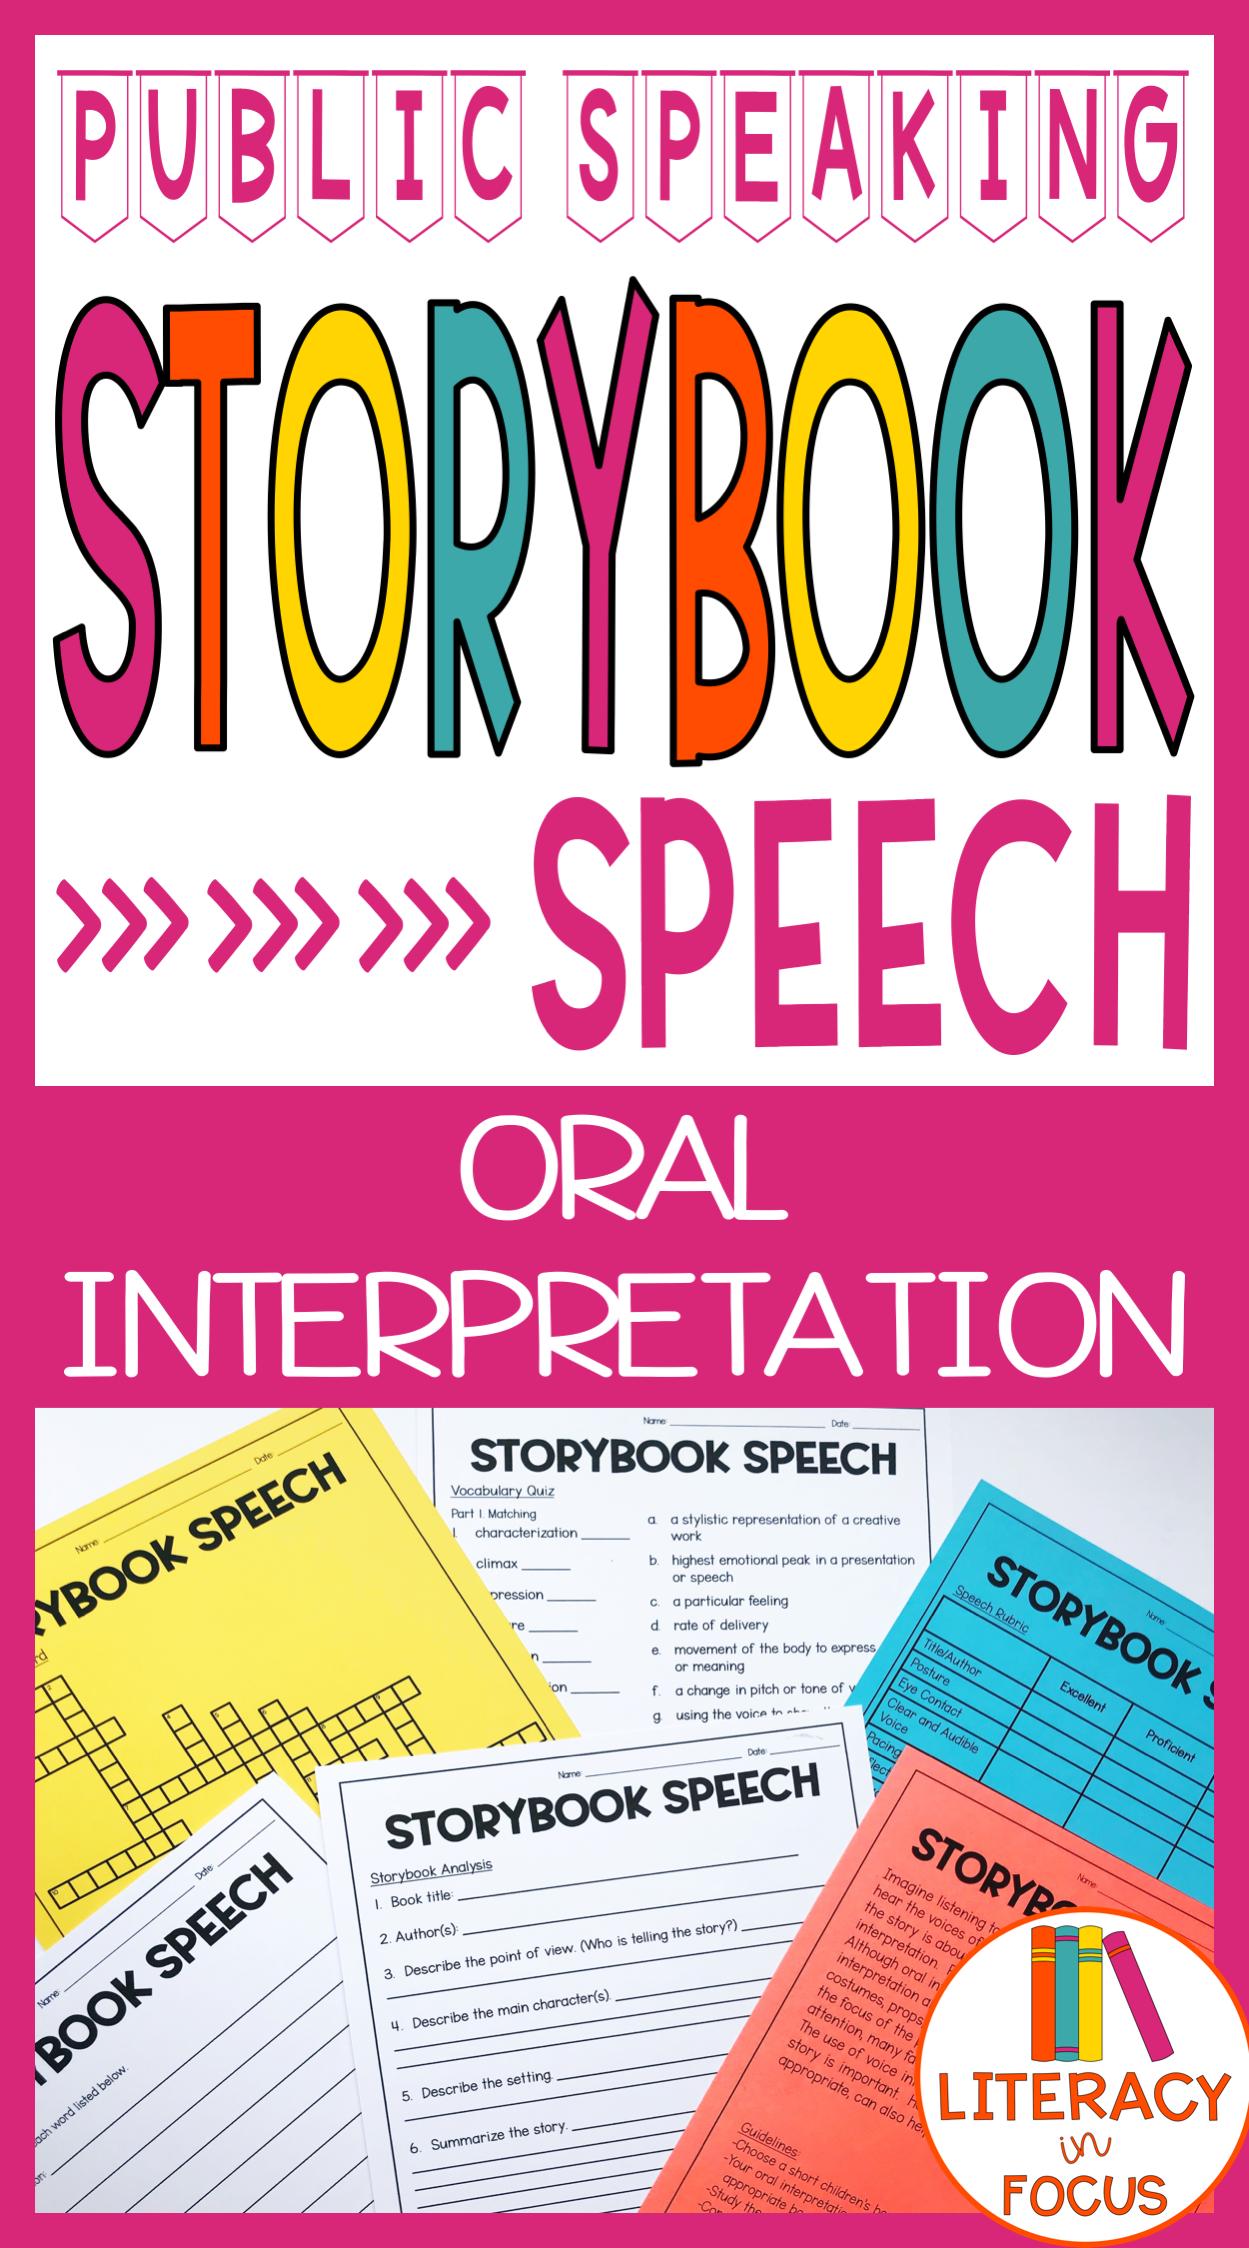 Oral Interpretation Public Speaking Lesson Plan